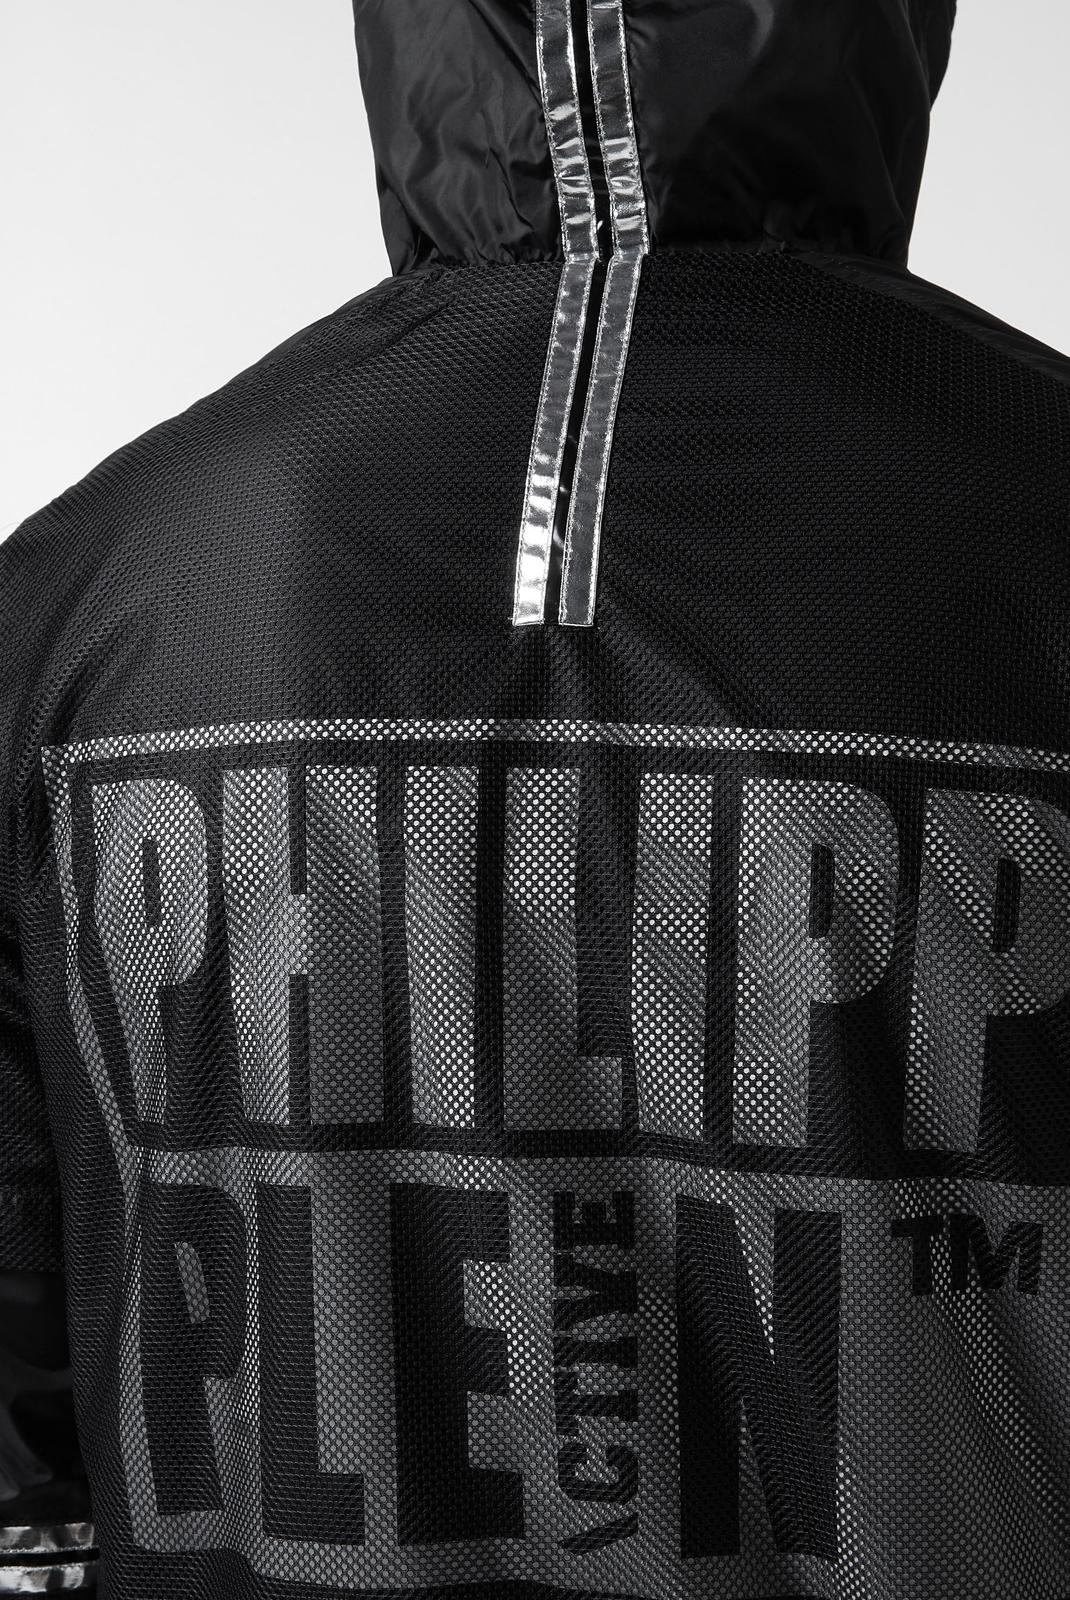 Blousons / doudounes  Philipp plein MRB0994 02 BLACK